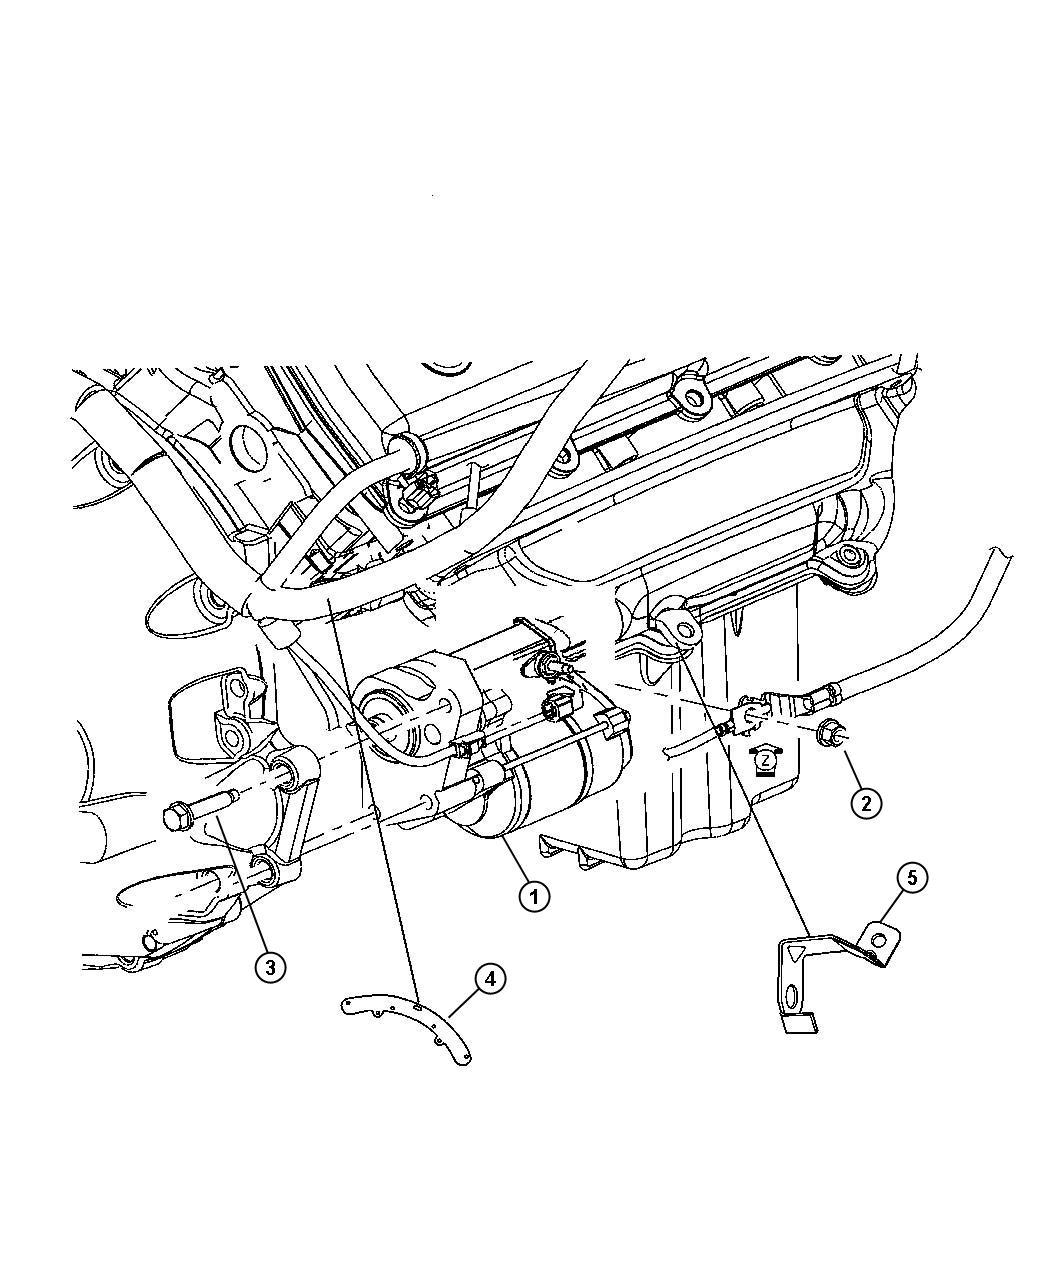 Chrysler 300 Starter Remanufactured Engine Related